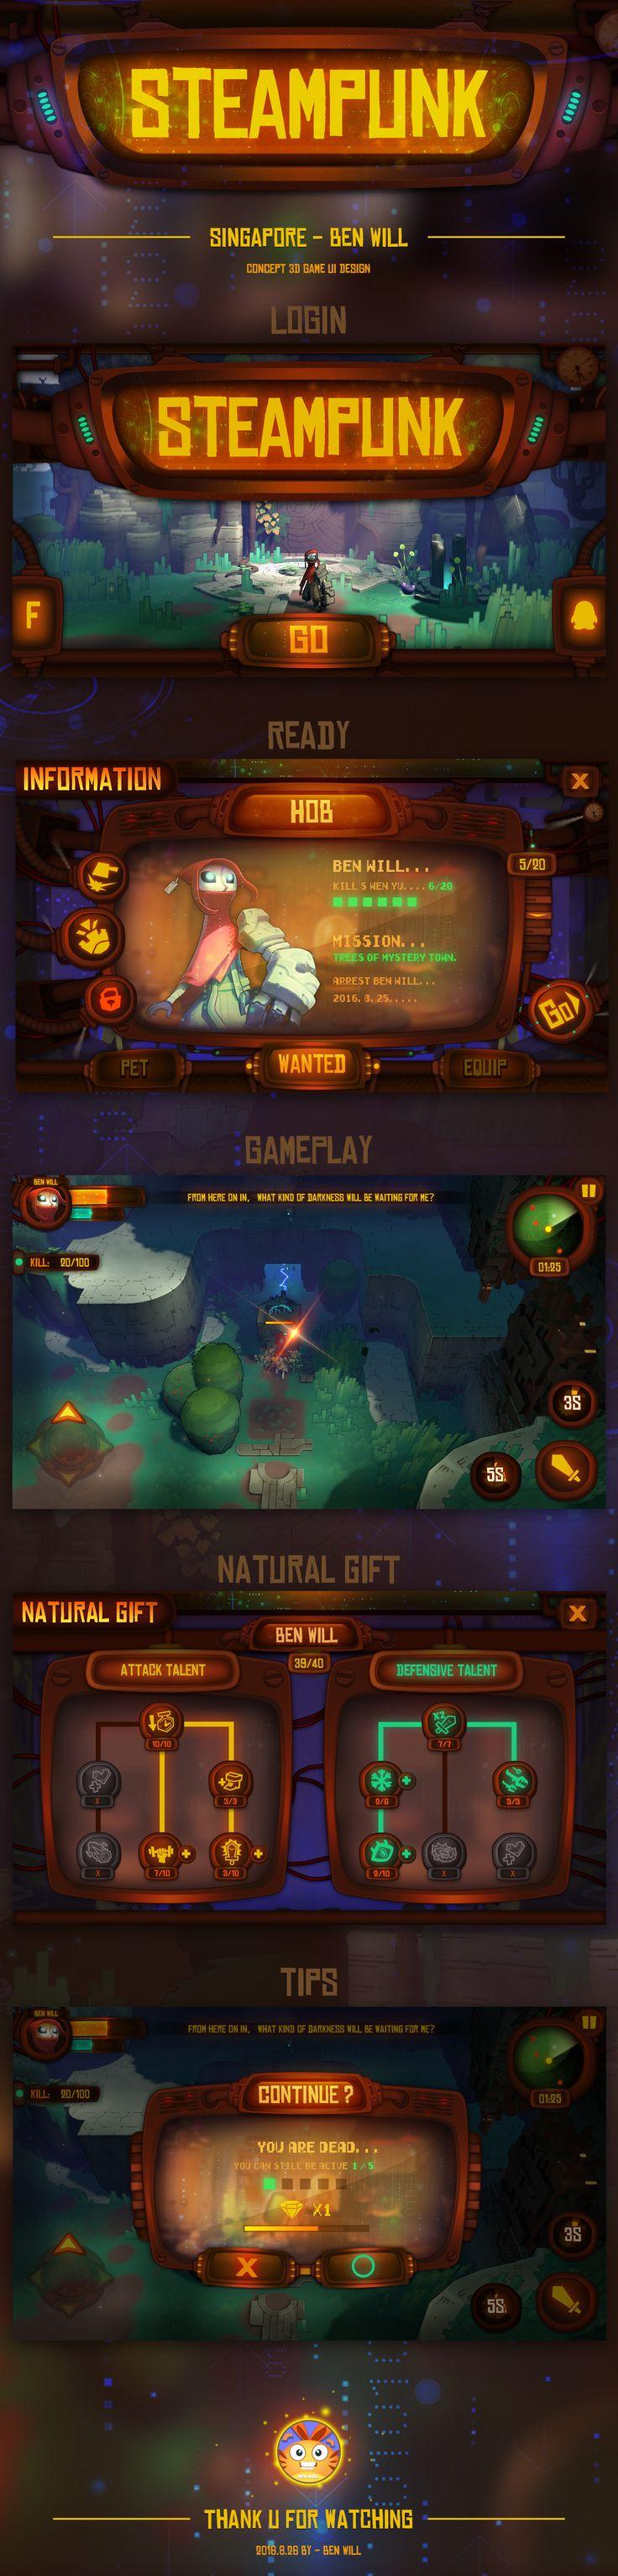 Concept Game Ui Design - HOB-STEAMPUNK